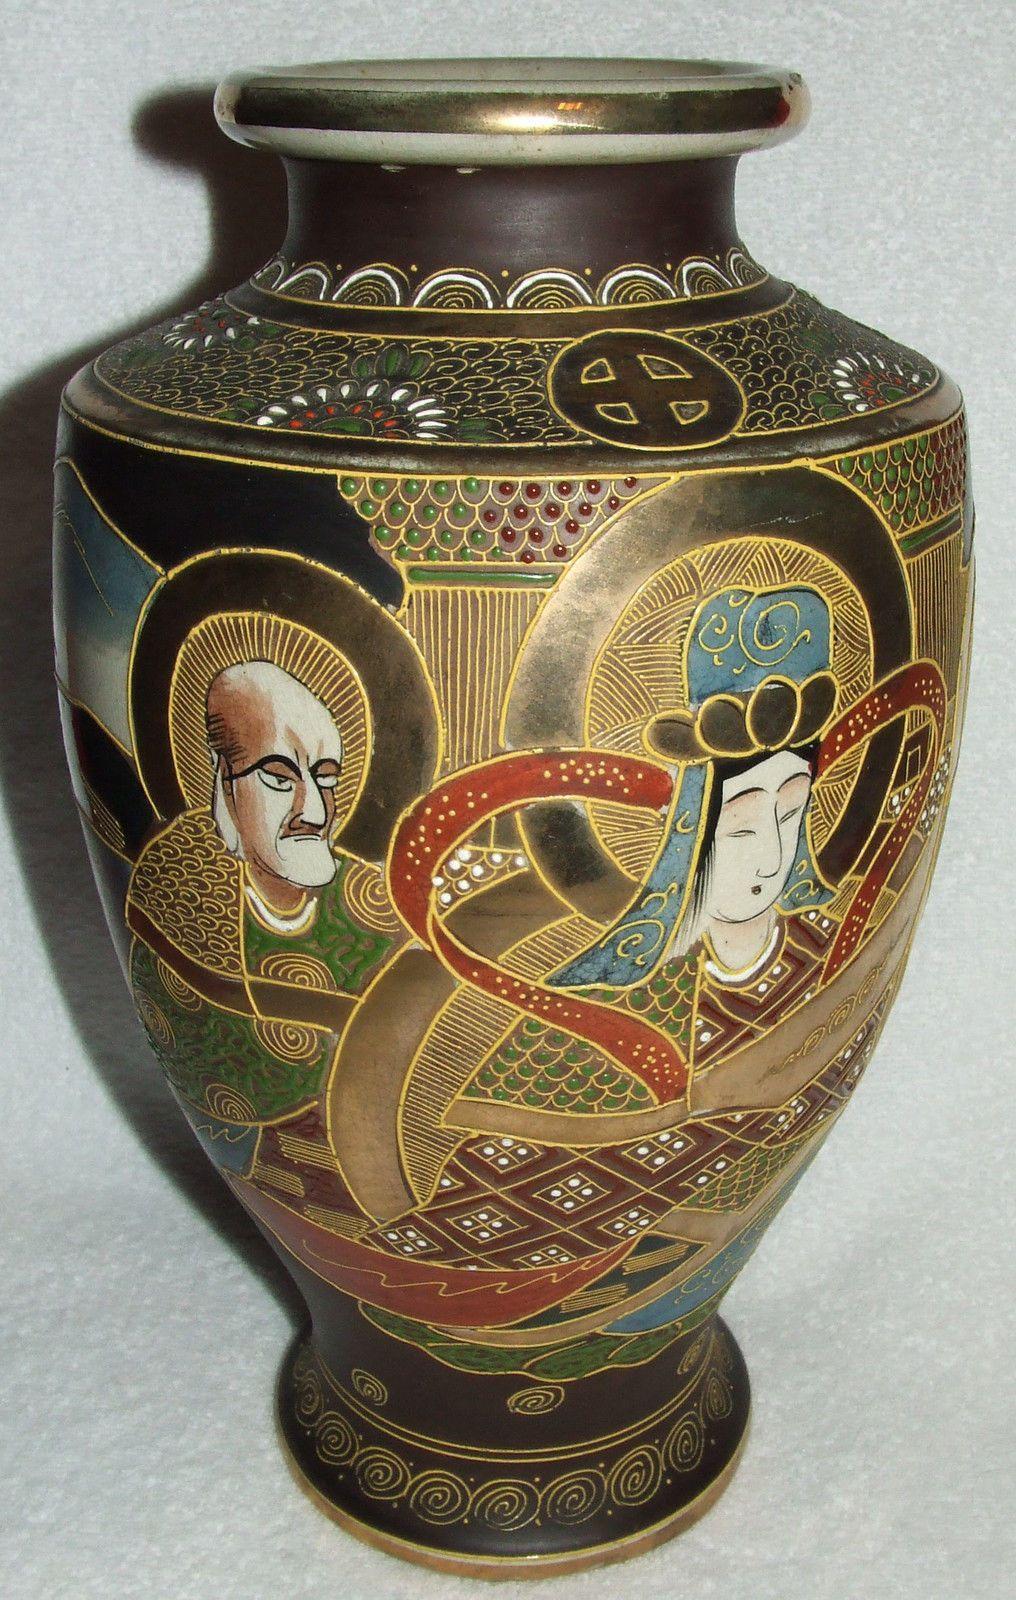 Signed shimazu crest antique japanese moriage satsuma 14 vase c signed shimazu crest antique japanese moriage satsuma 14 vase c meiji reviewsmspy